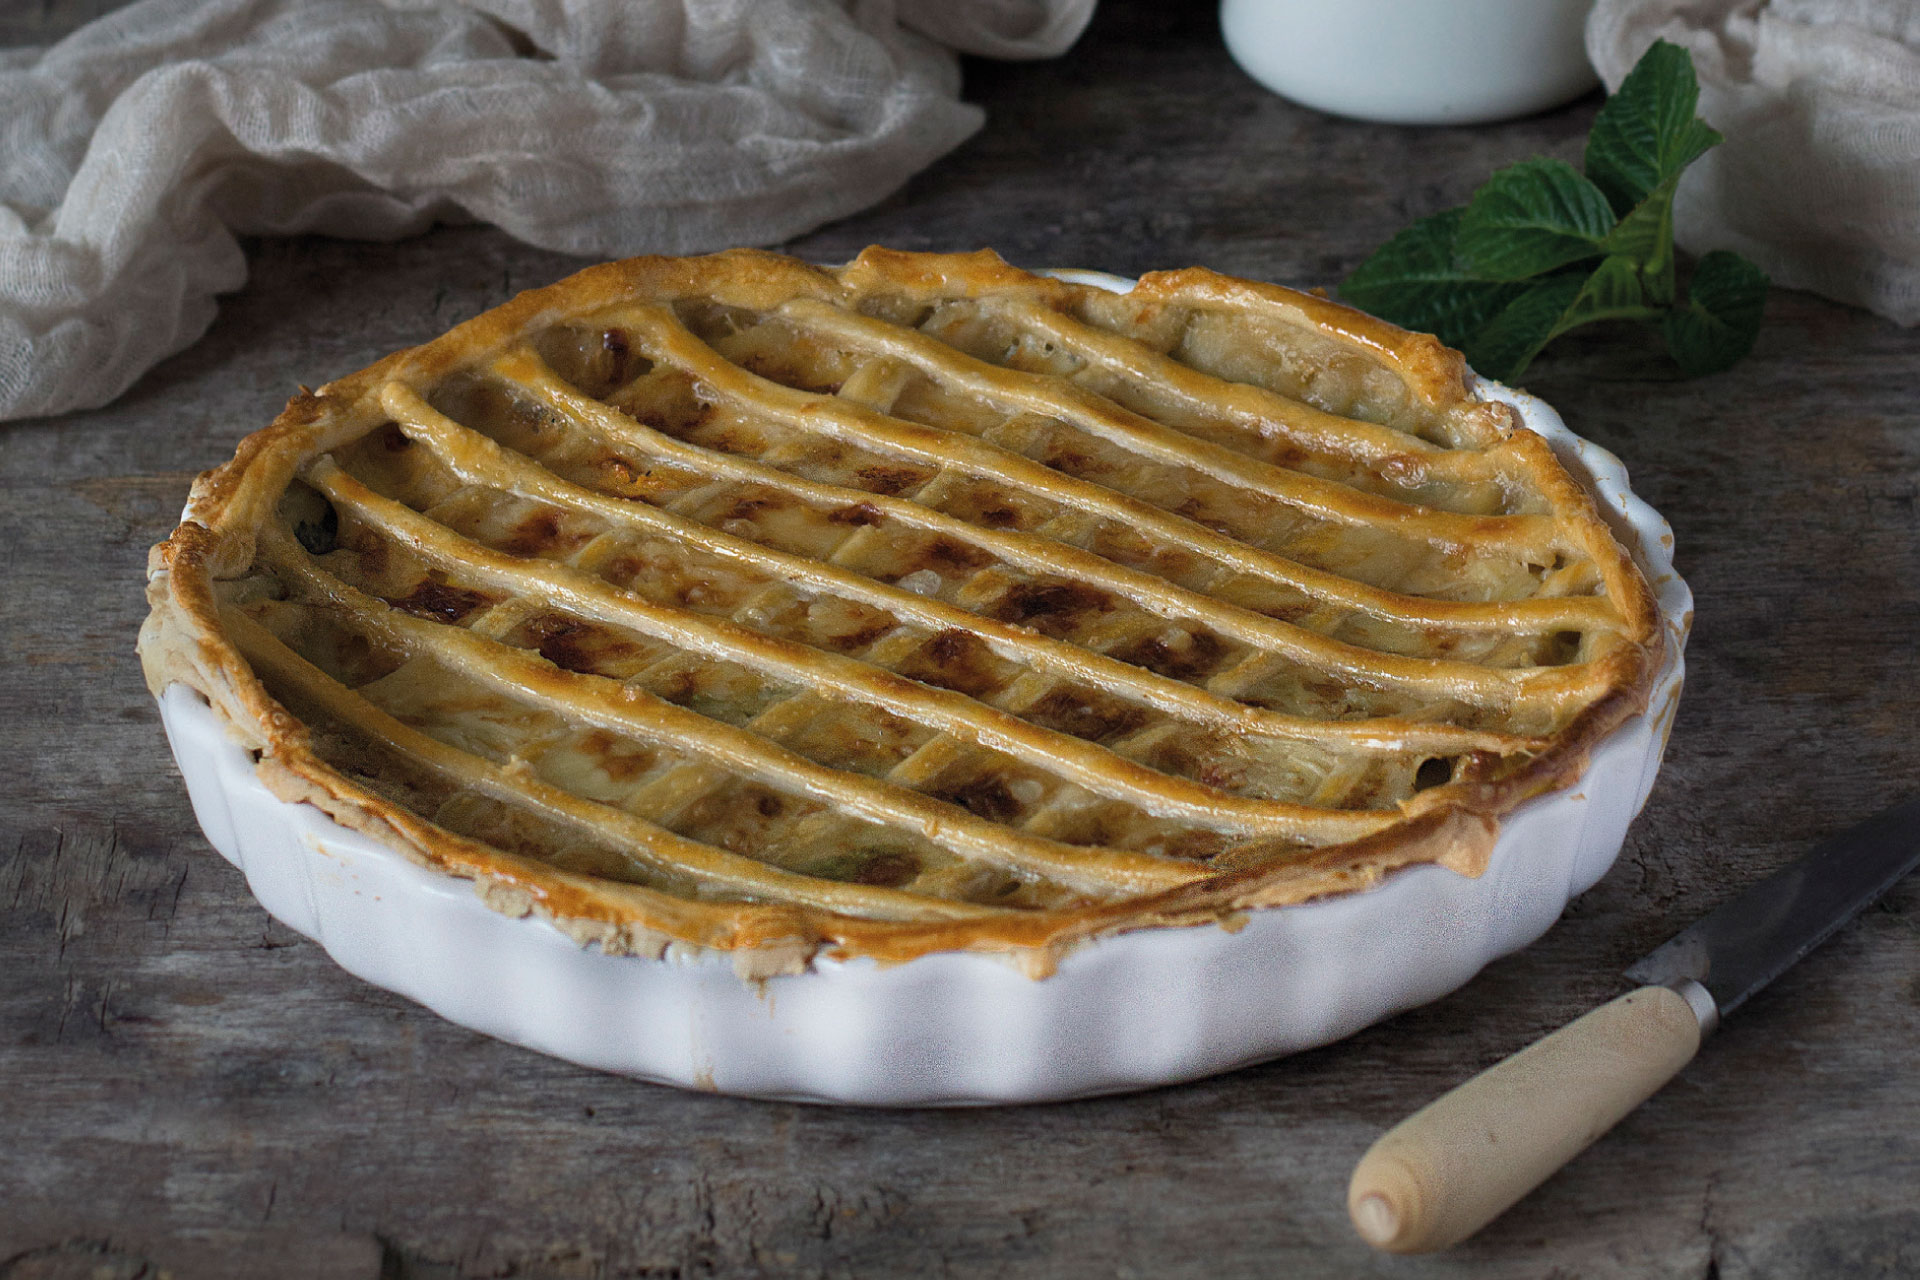 Receta de Tarta rústica salada Arcobaleno | Cocinas Santos | Santiago Interiores